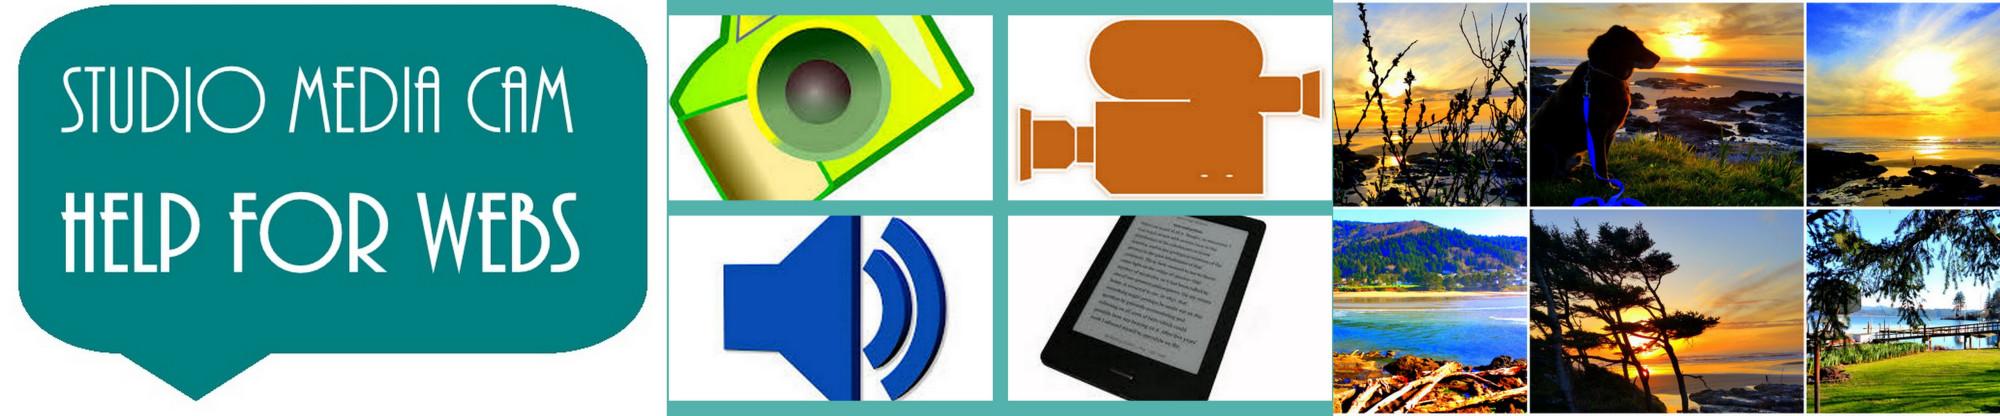 Help for Webs – StudioMediaCam – Multimedia, Marketing and Websites